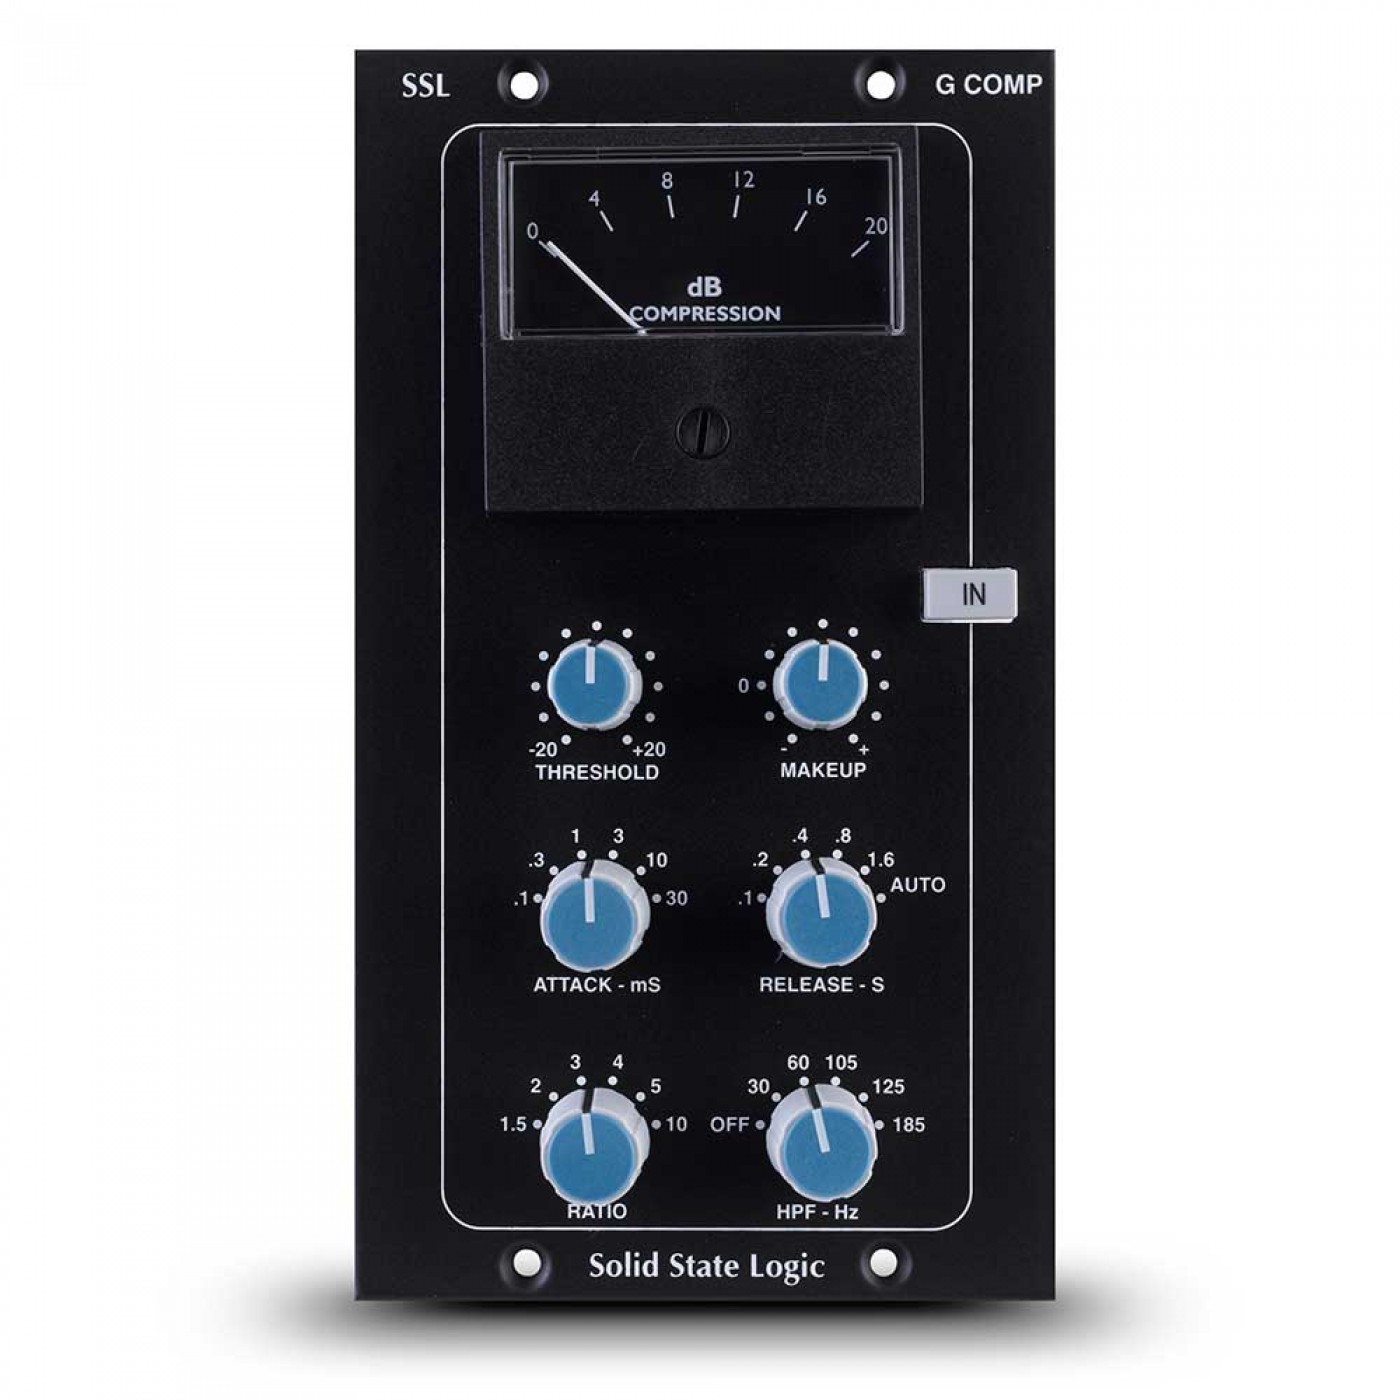 SSL G COMP Stereo Bus Compressor MKII 500 | Rage Audio